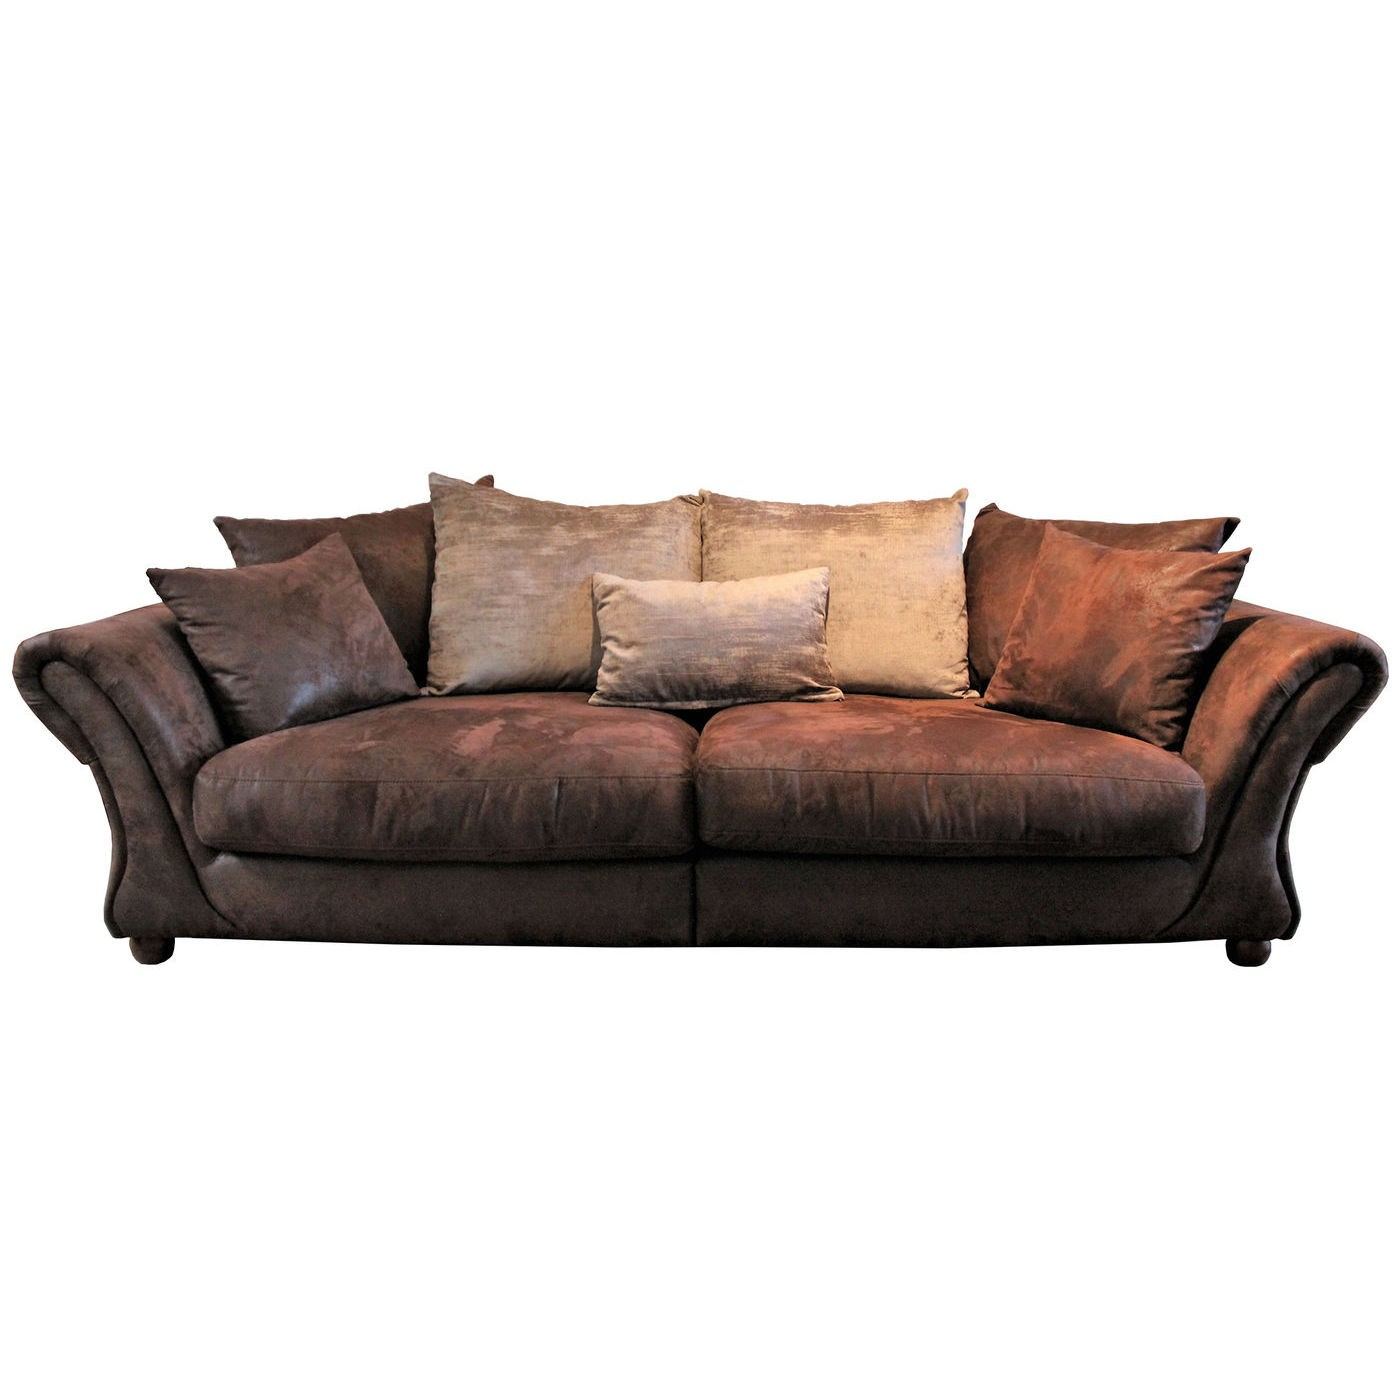 Full Size of Kare Sofa Dschinn Proud Bed Infinity Couch Gianni Sale Design Furniture List Sales 3er Big Poco überwurf Kunstleder Günstig Kaufen Modulares Husse Heimkino Sofa Kare Sofa